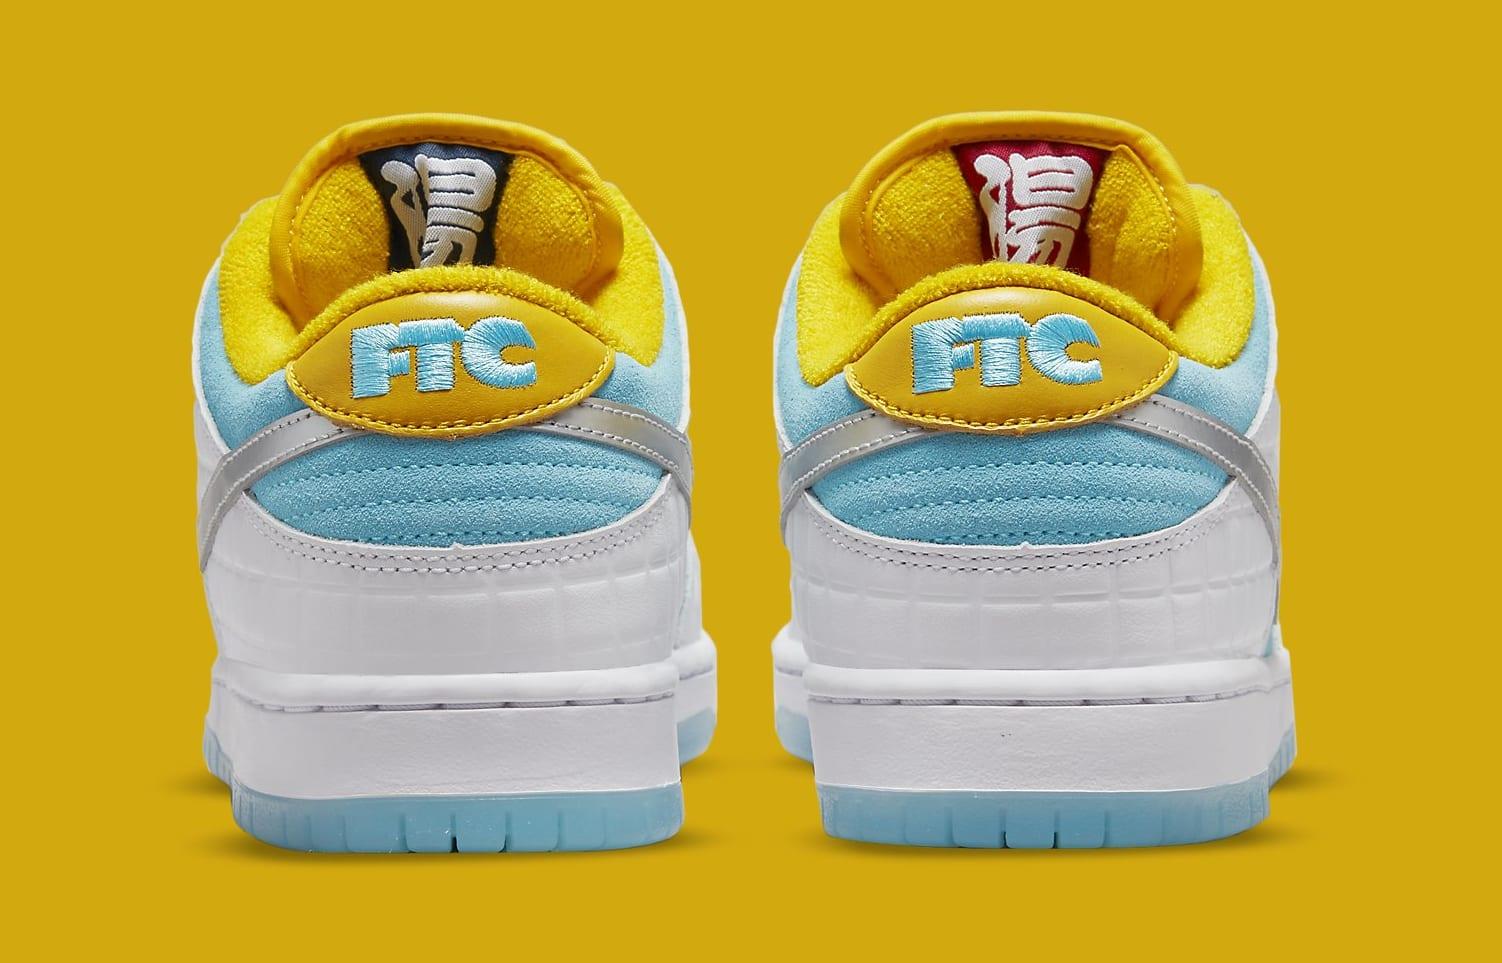 FTC x Nike SB Dunk Low DH7687-400 Heel